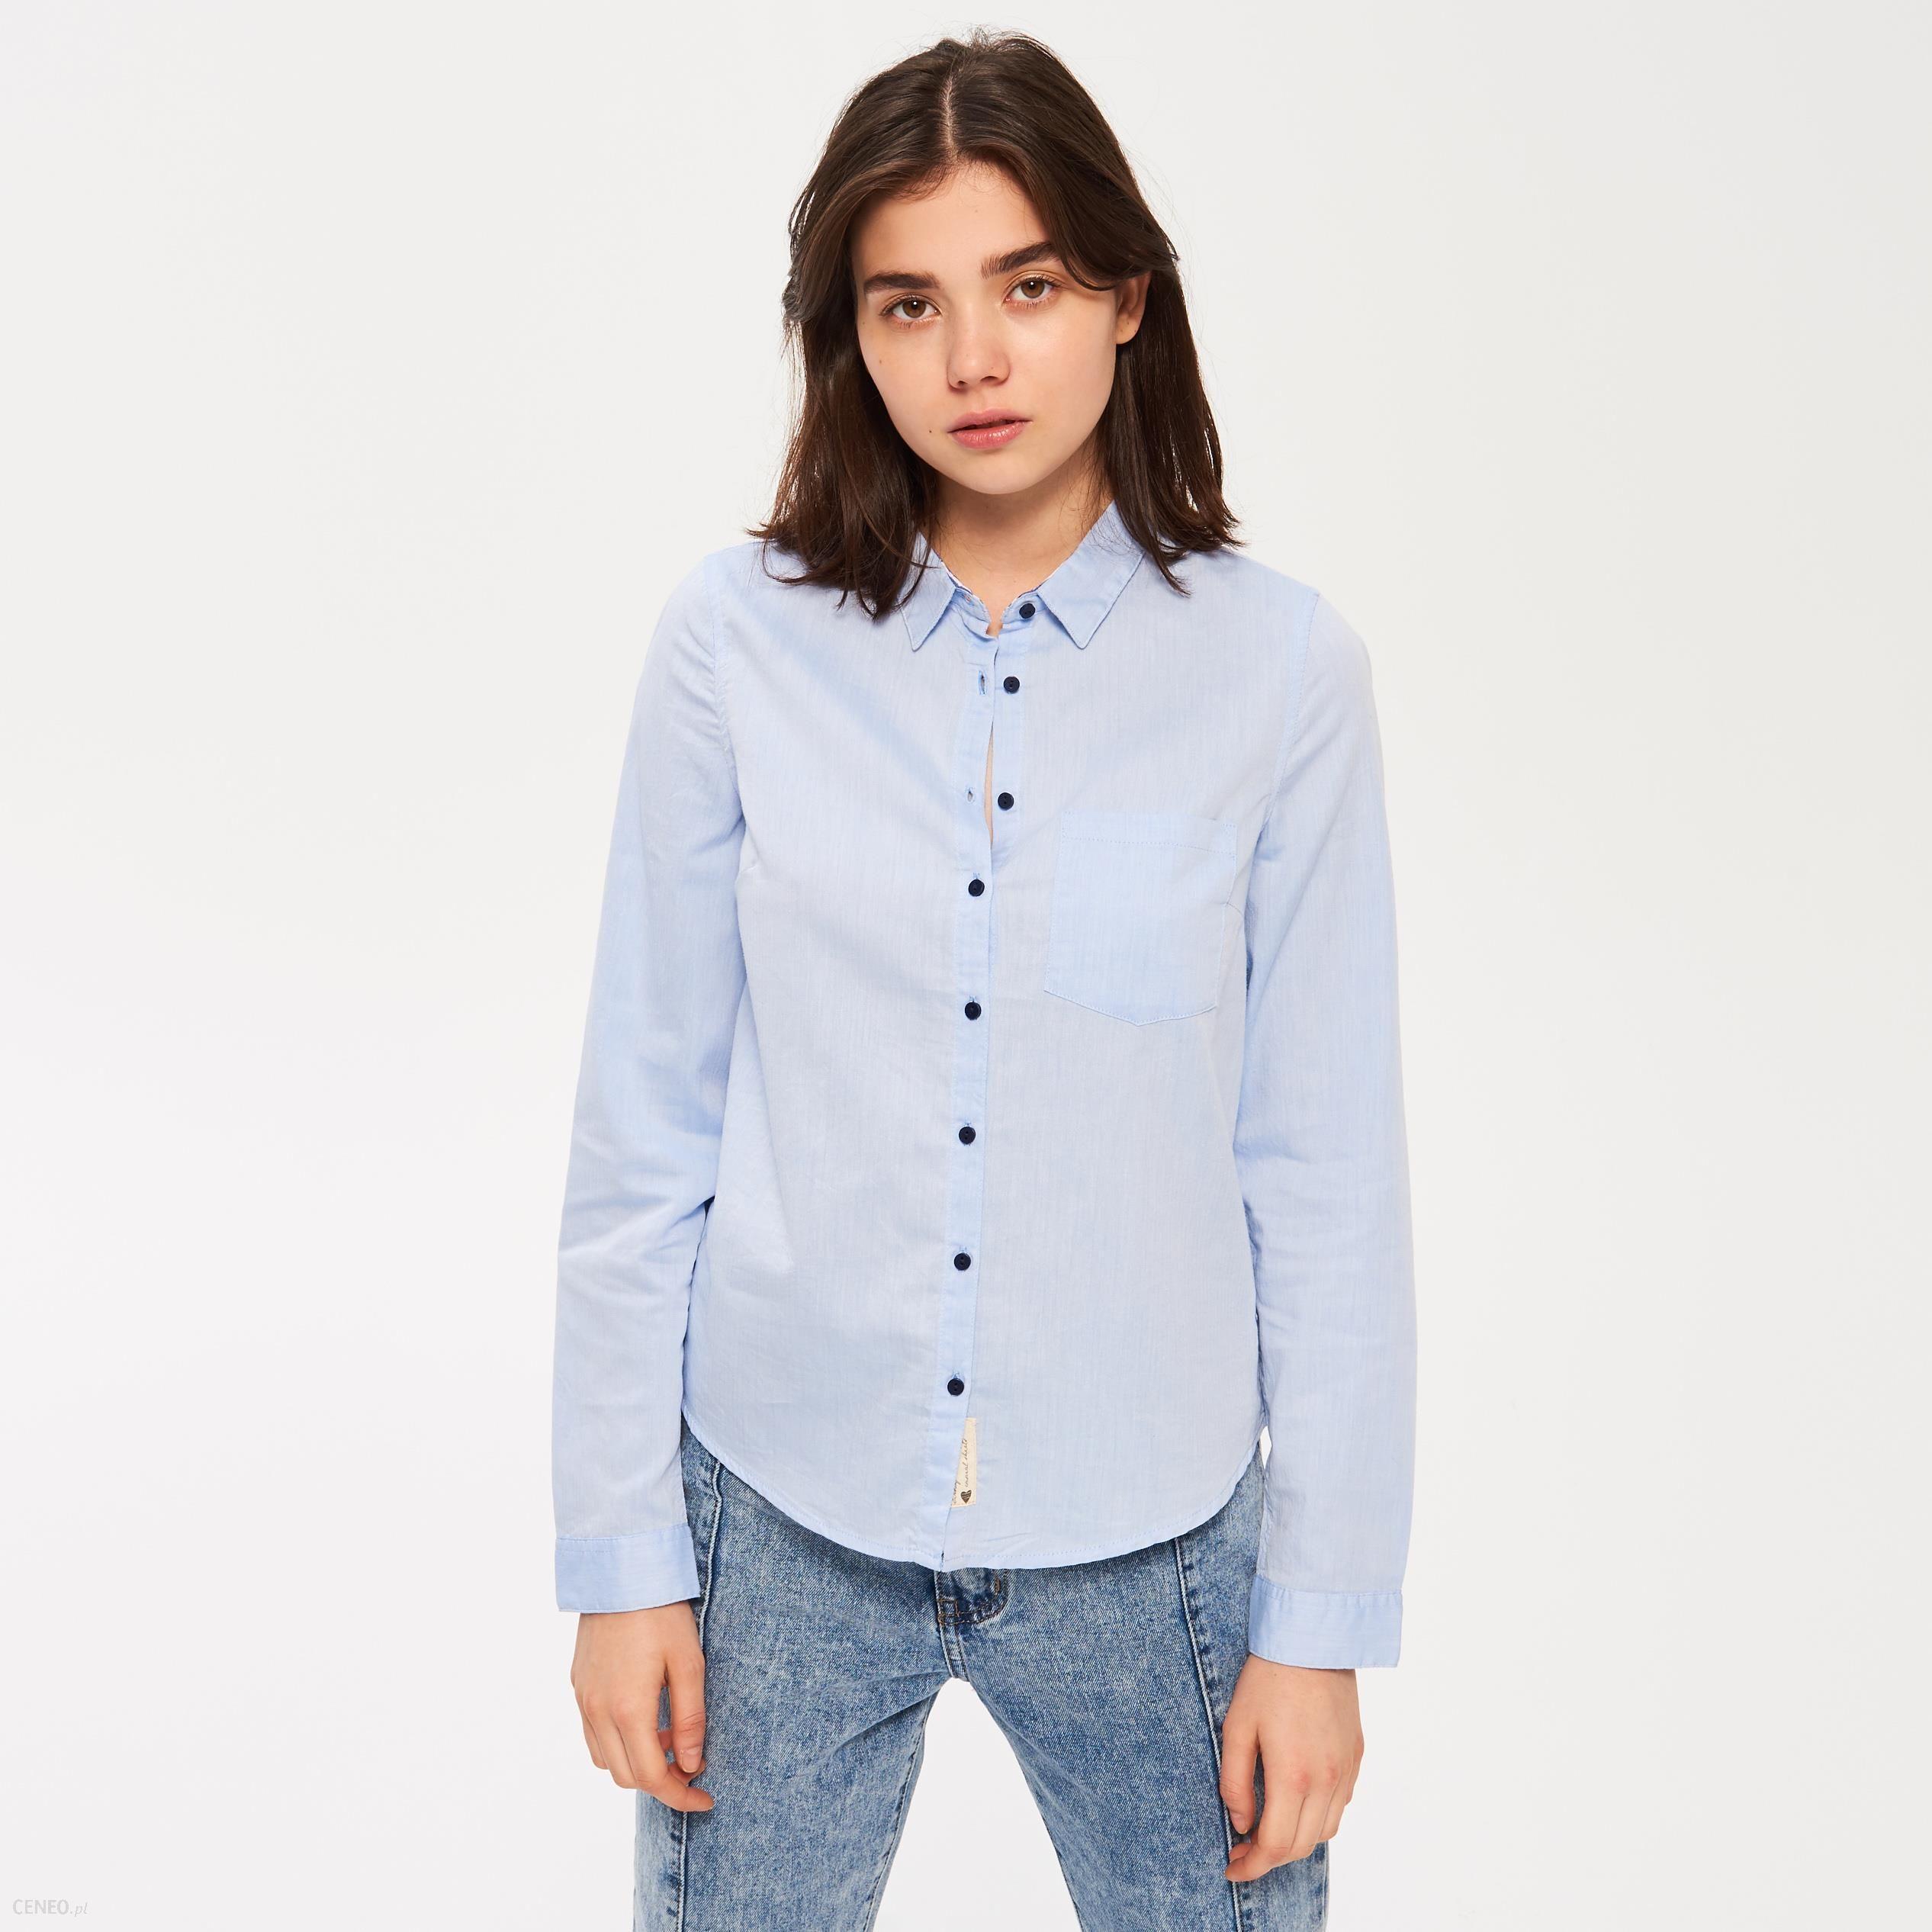 Sinsay Koszula z łatami na łokciach Niebieski Ceny i  2mPcs